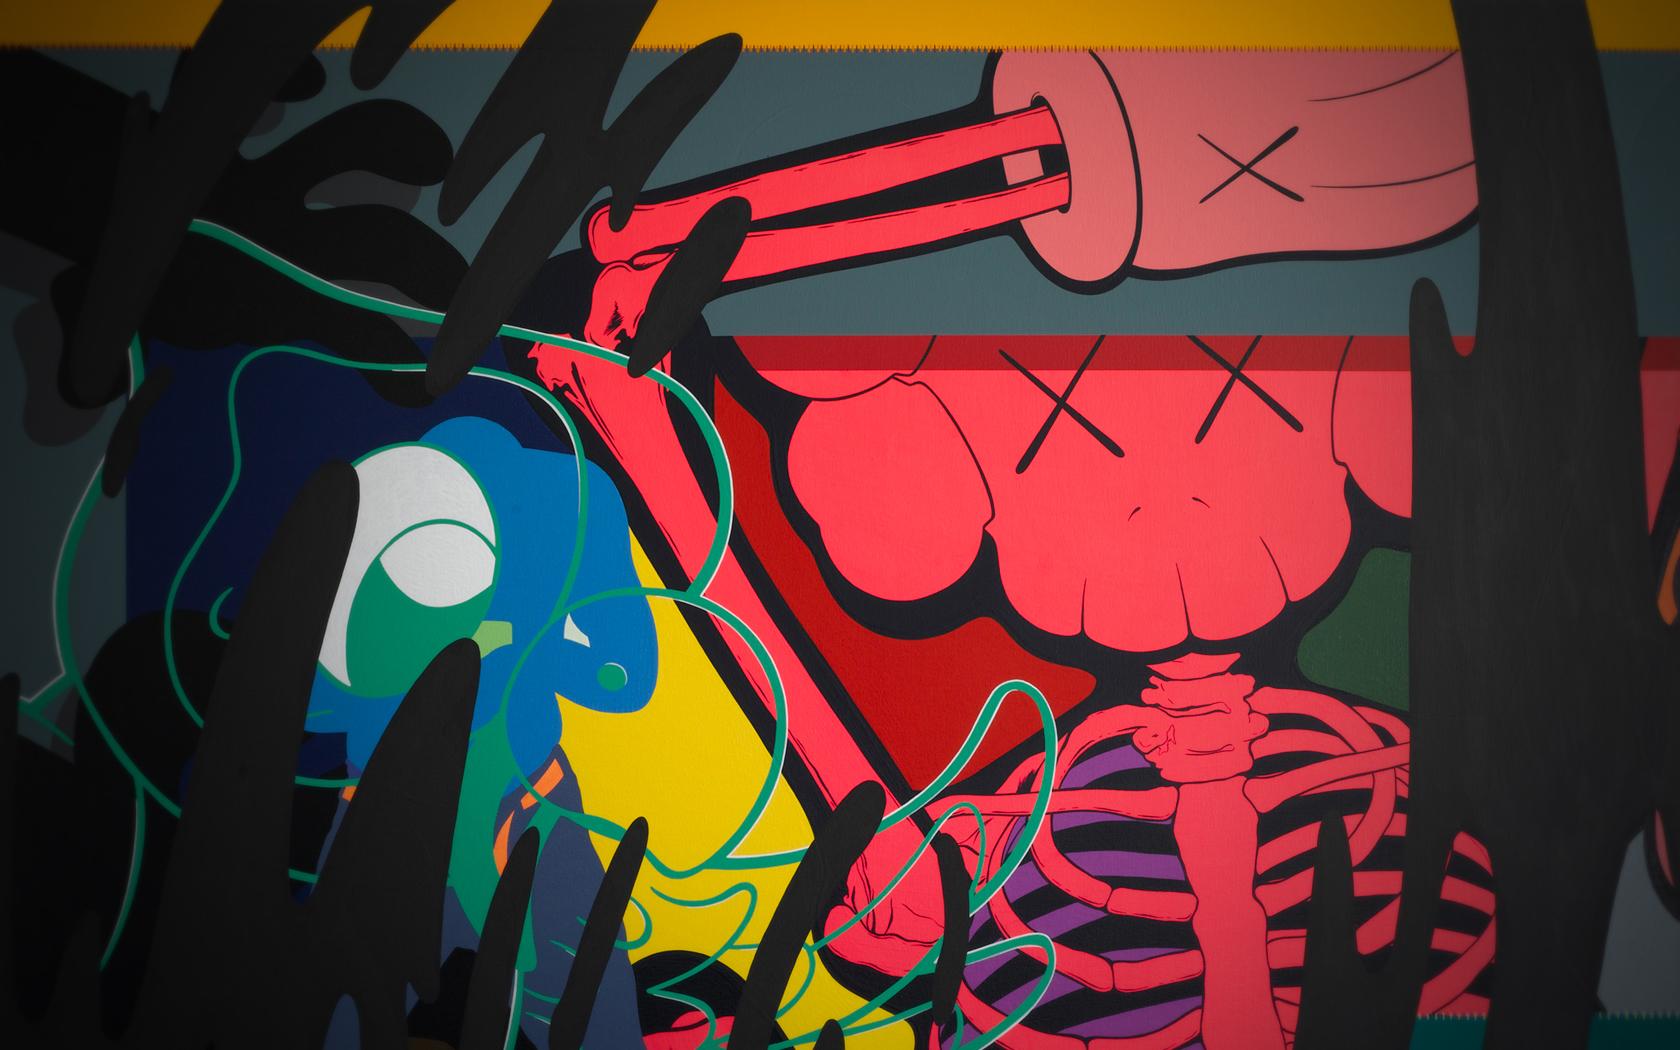 Wallpaper 1680x1050 Px Abstract Color Dark Graffiti